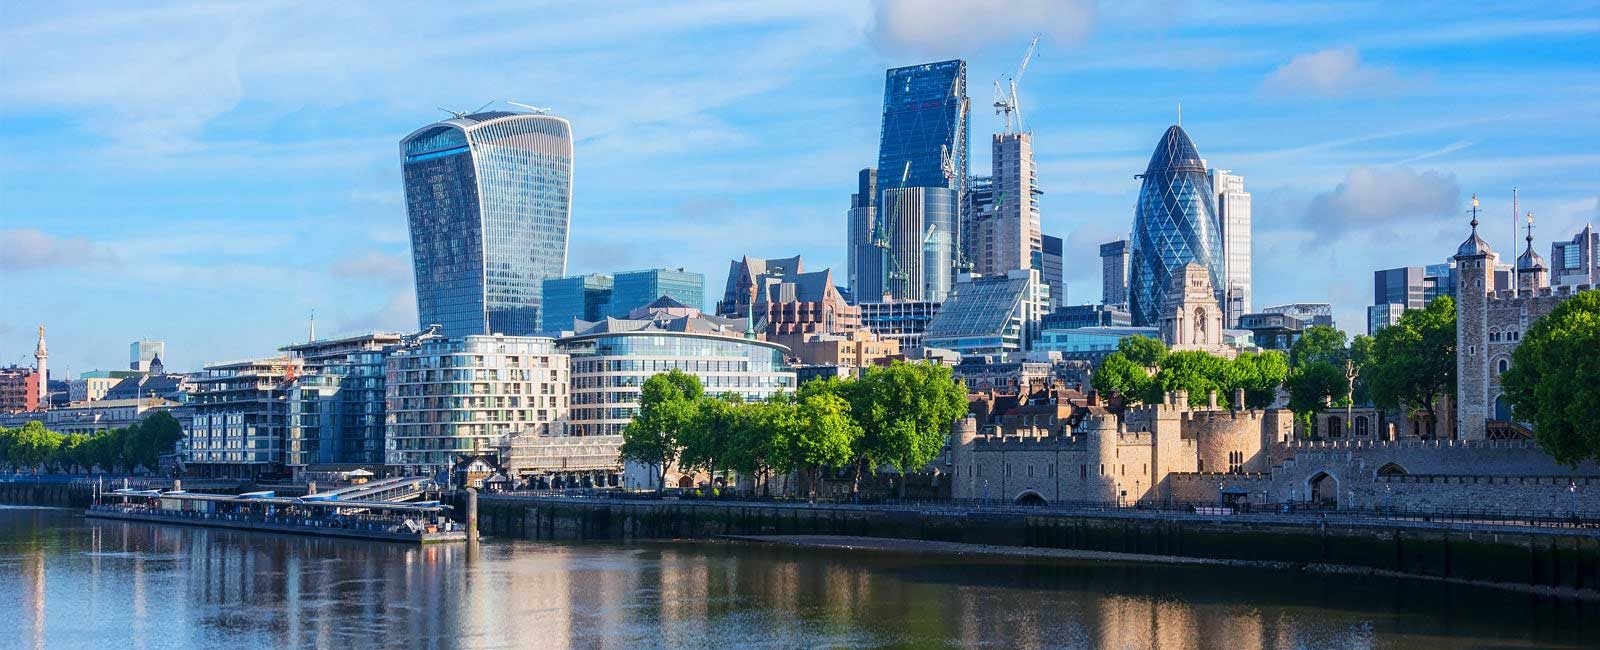 London Business Trip